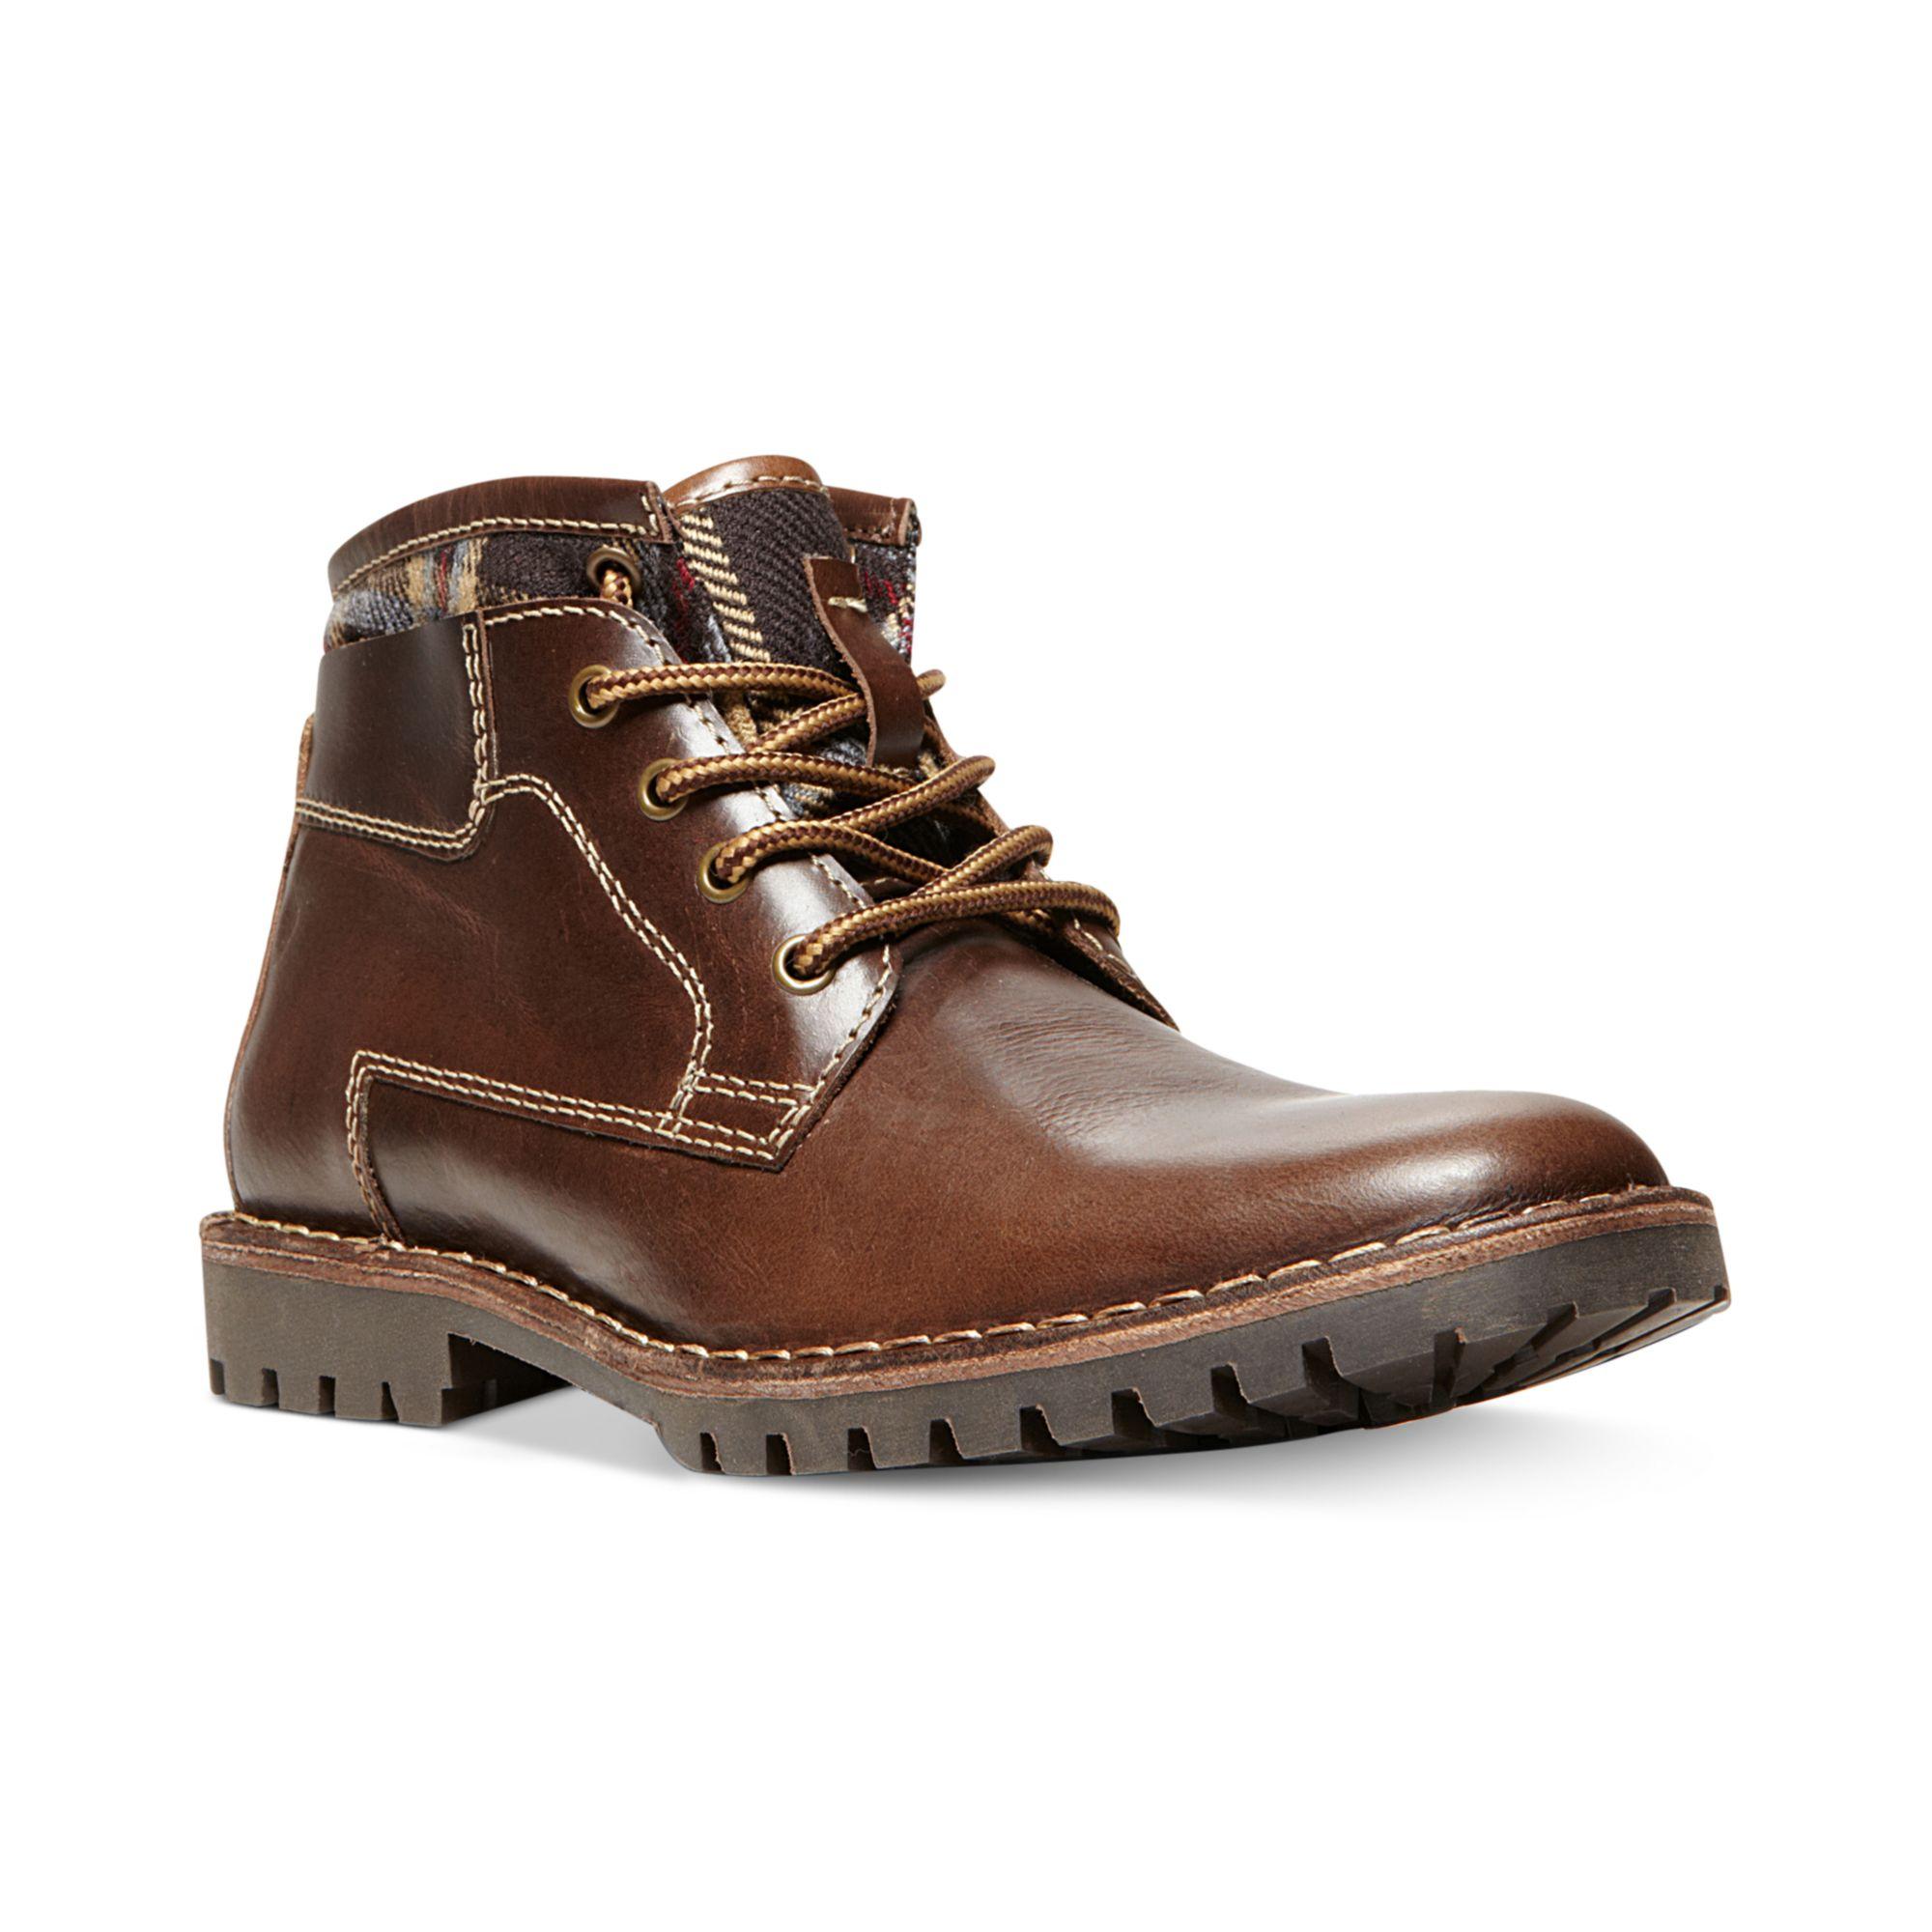 steve madden nickkel boots in brown for brown